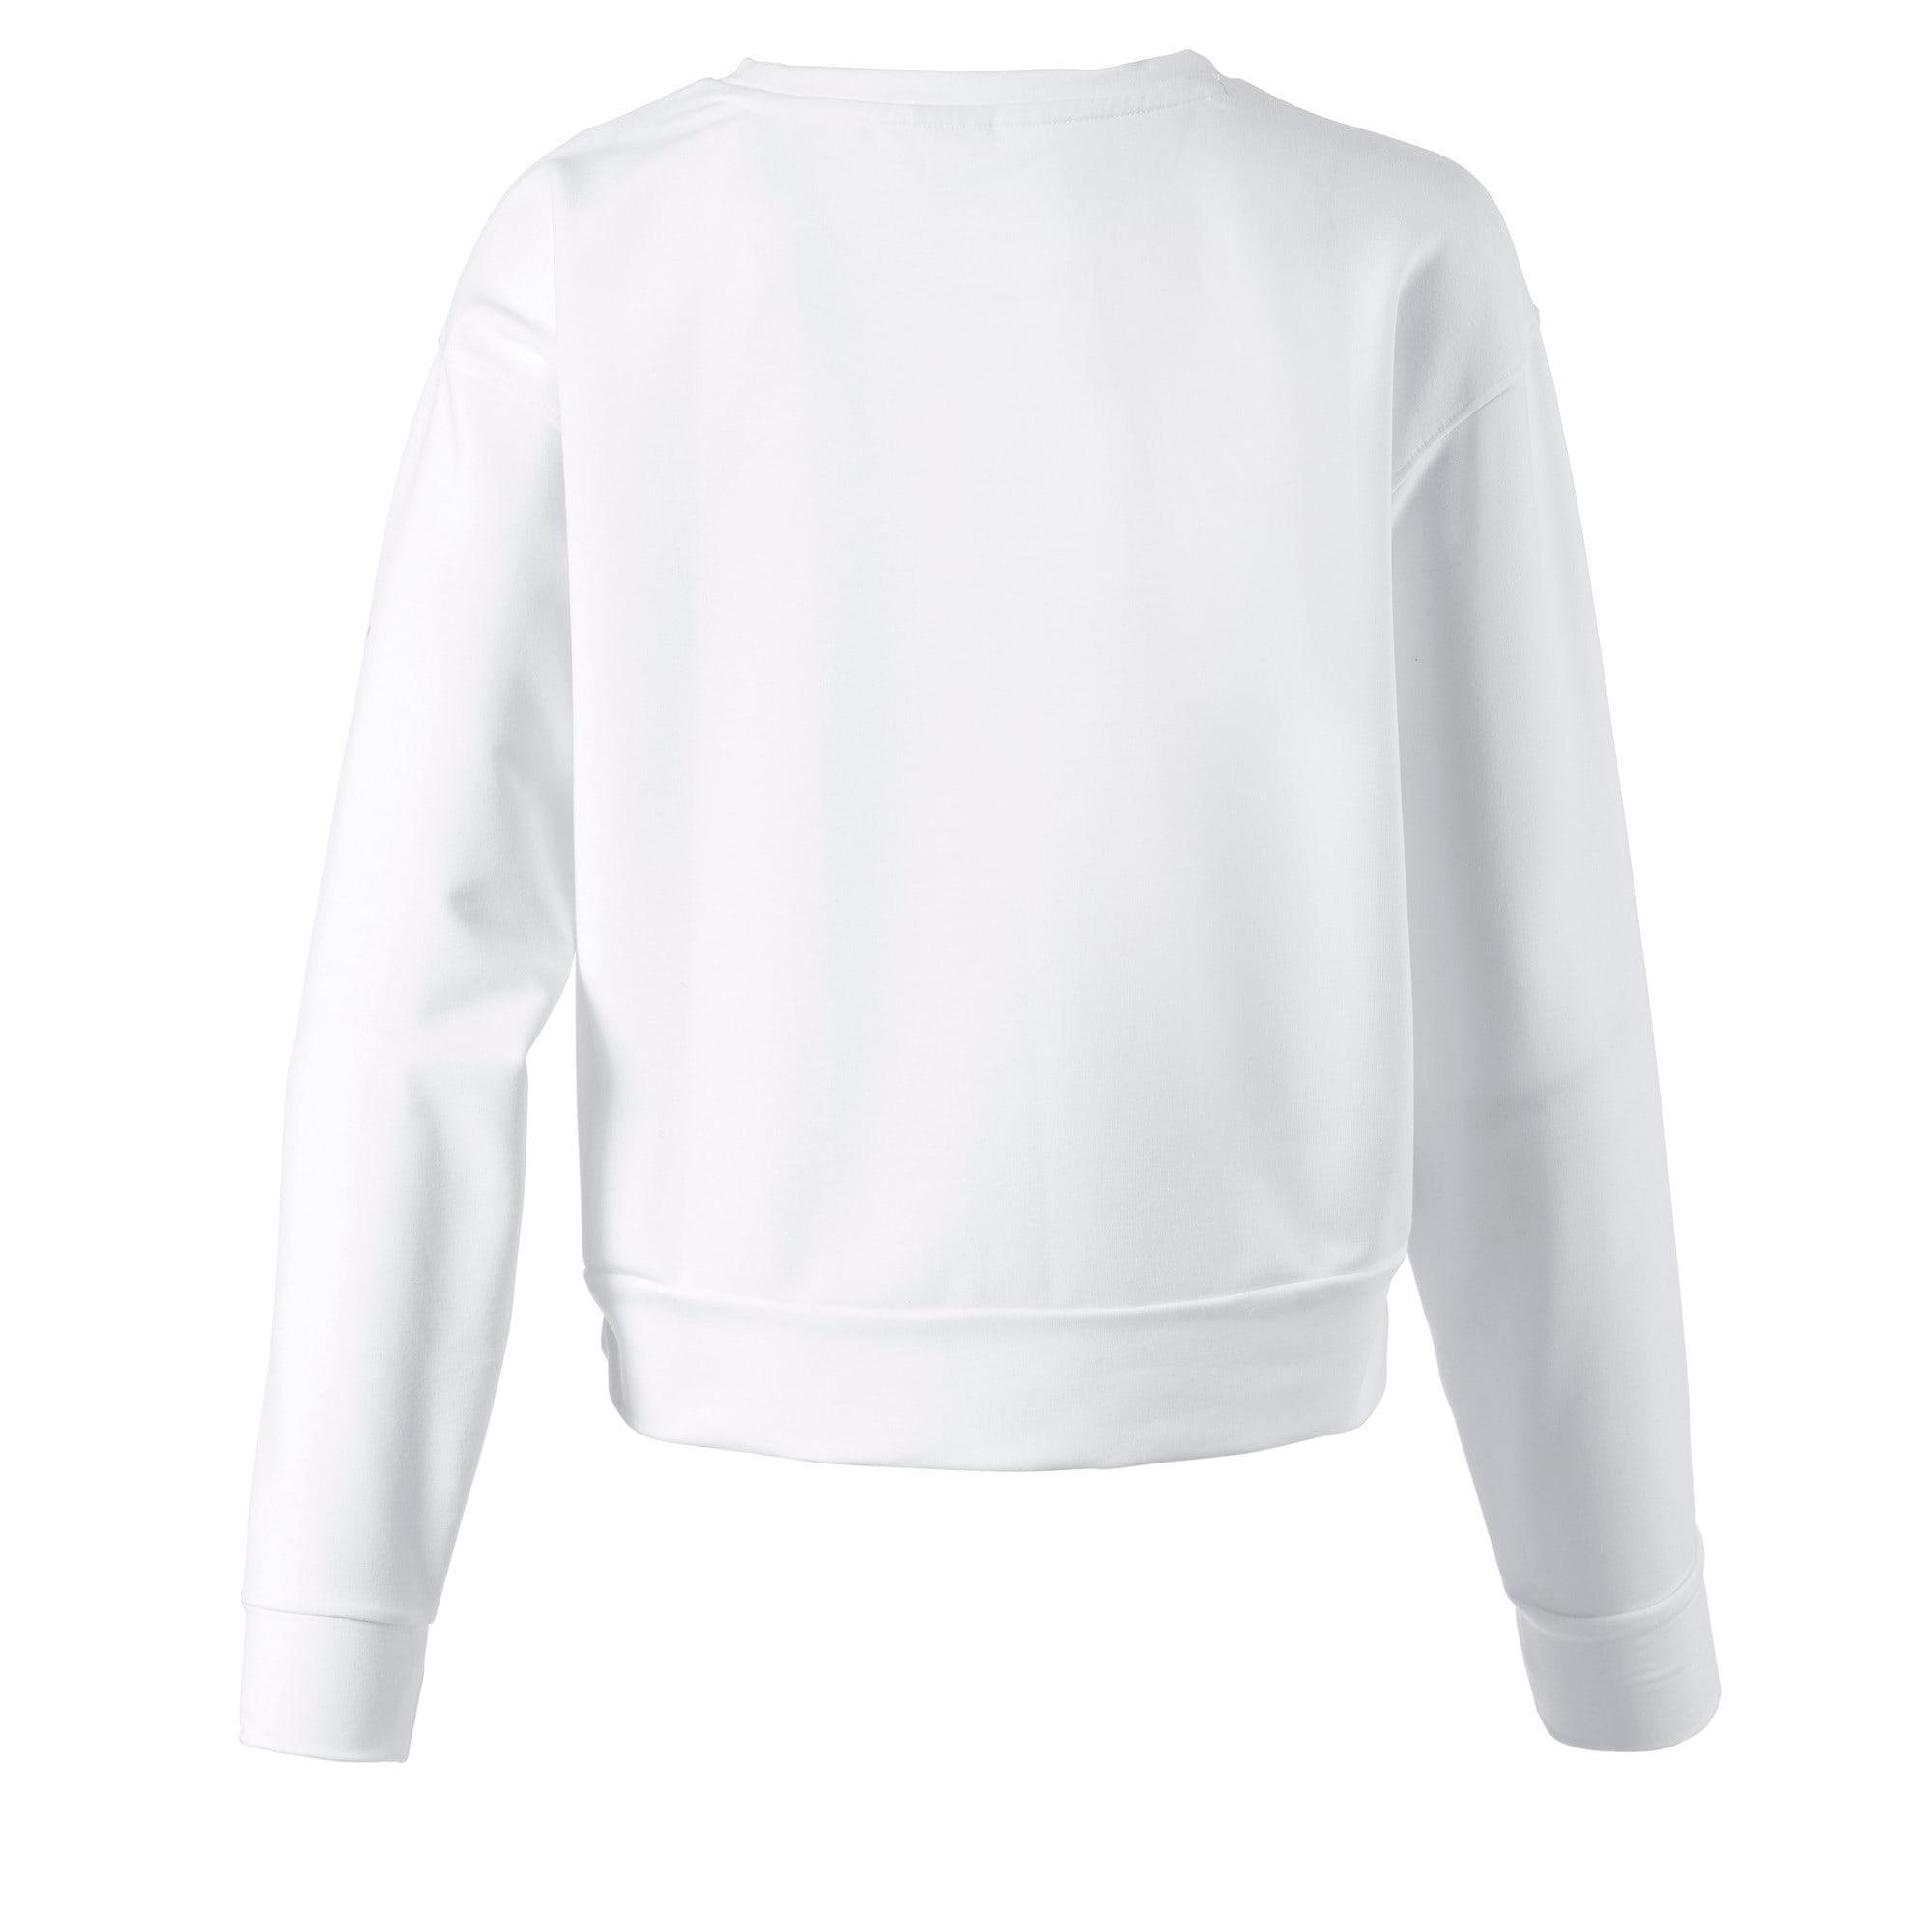 Thumbnail 2 of Modern Sports Crew Girls' Sweater, Puma White, medium-IND